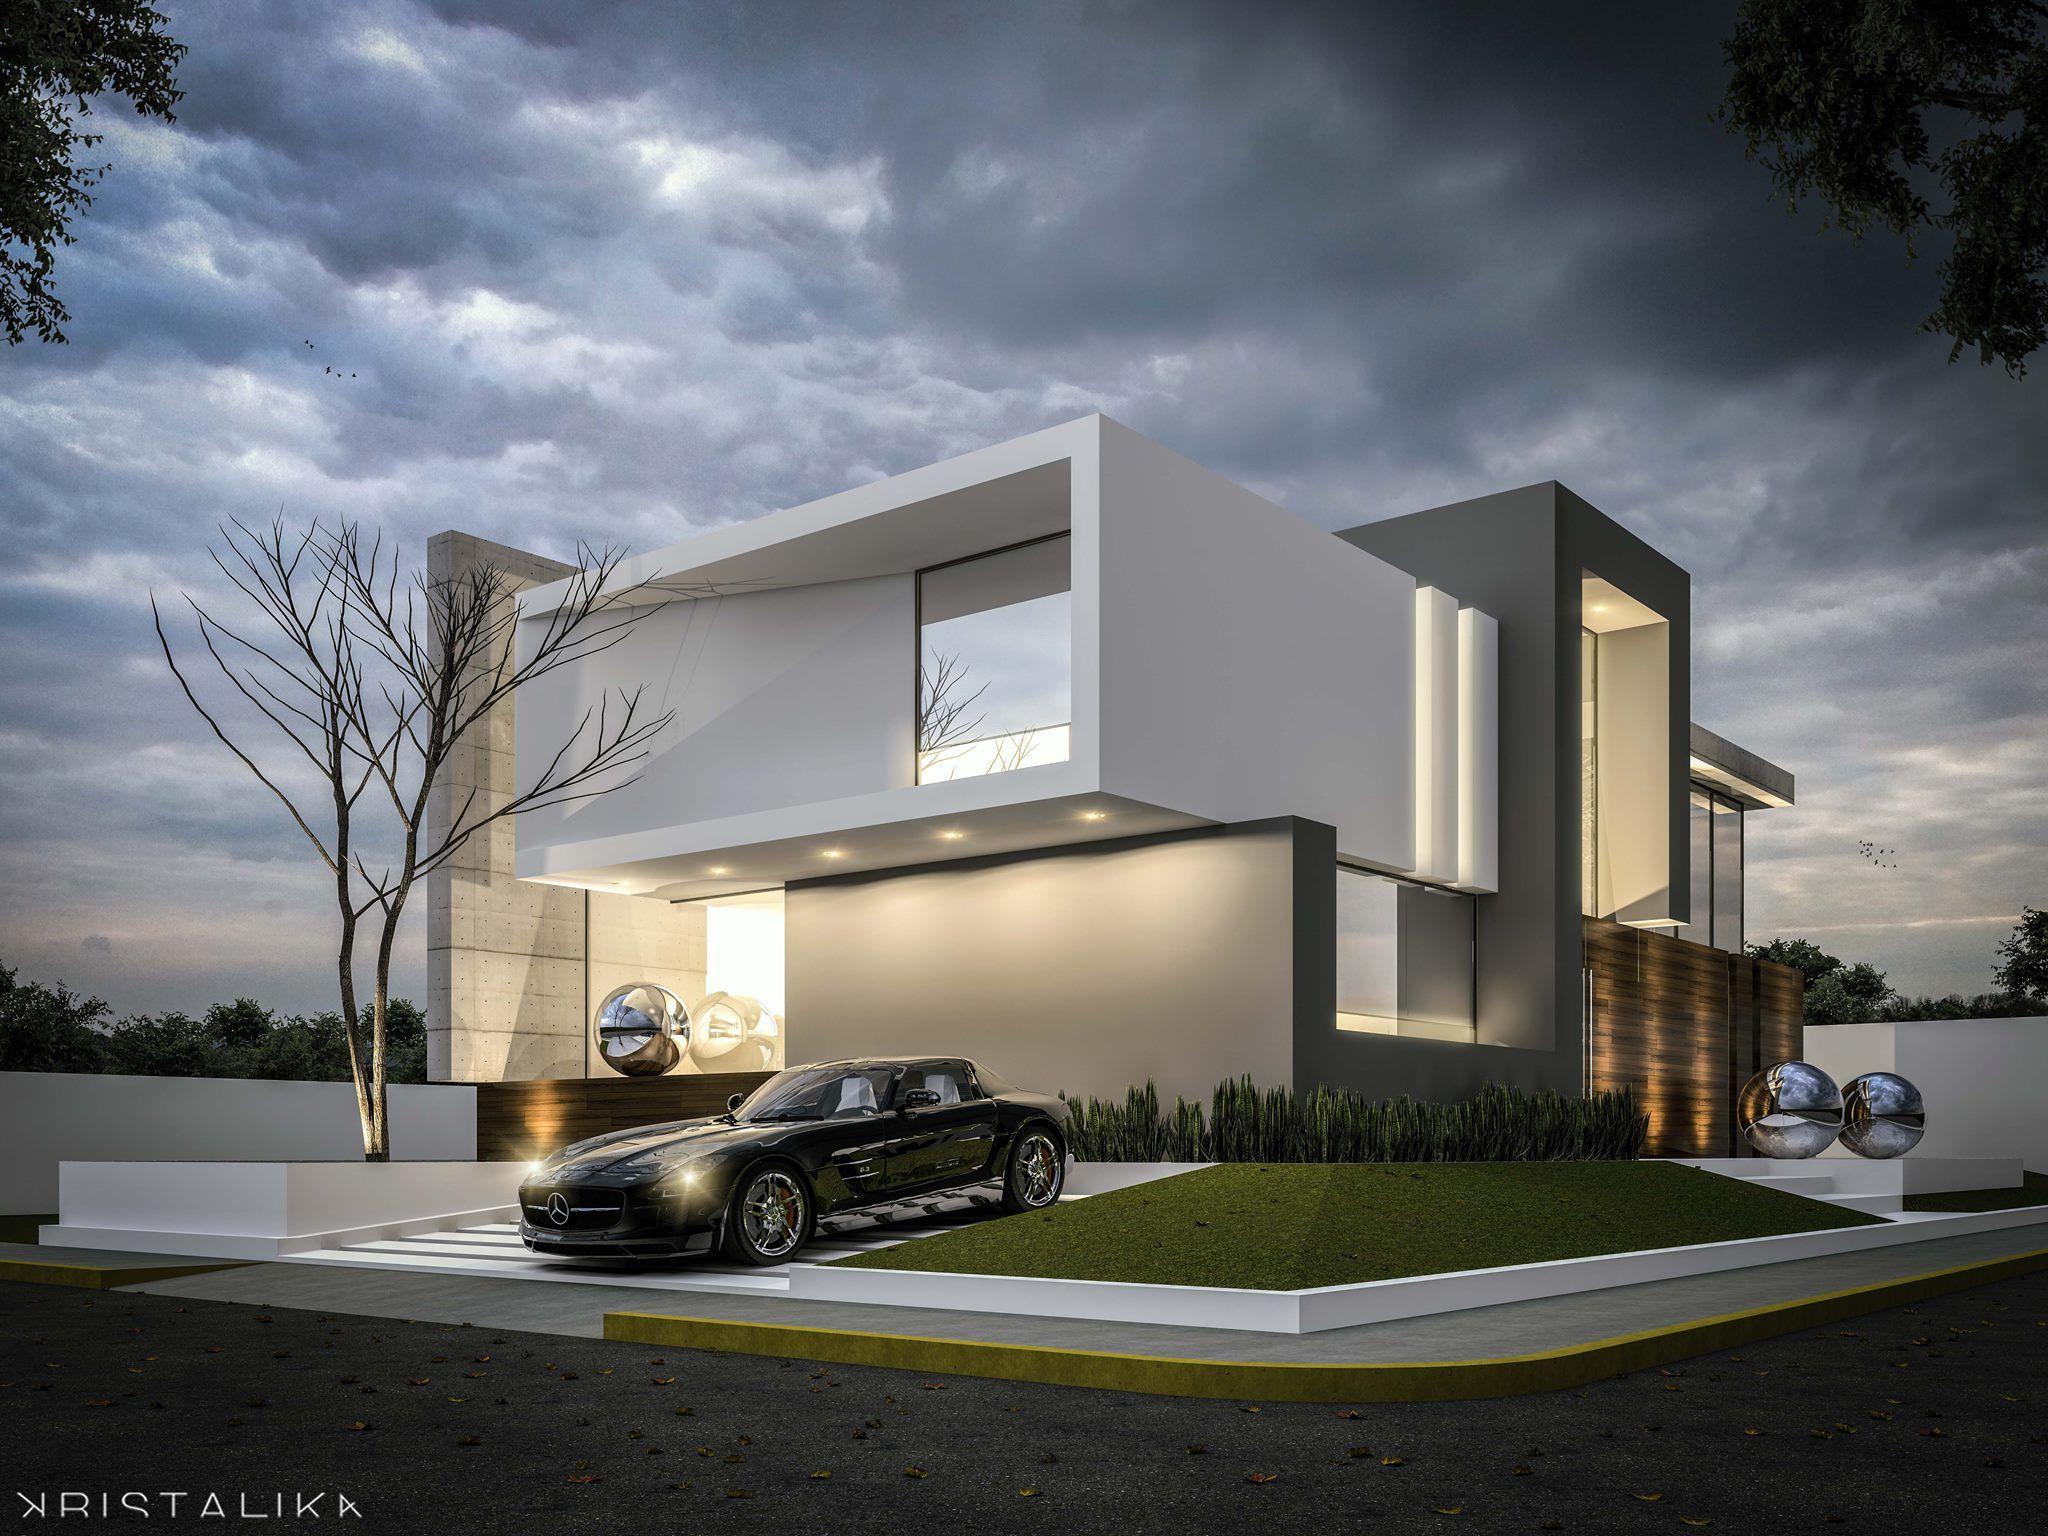 Punto sur house kristalika arquitecture and interior - Casas arquitectura moderna ...